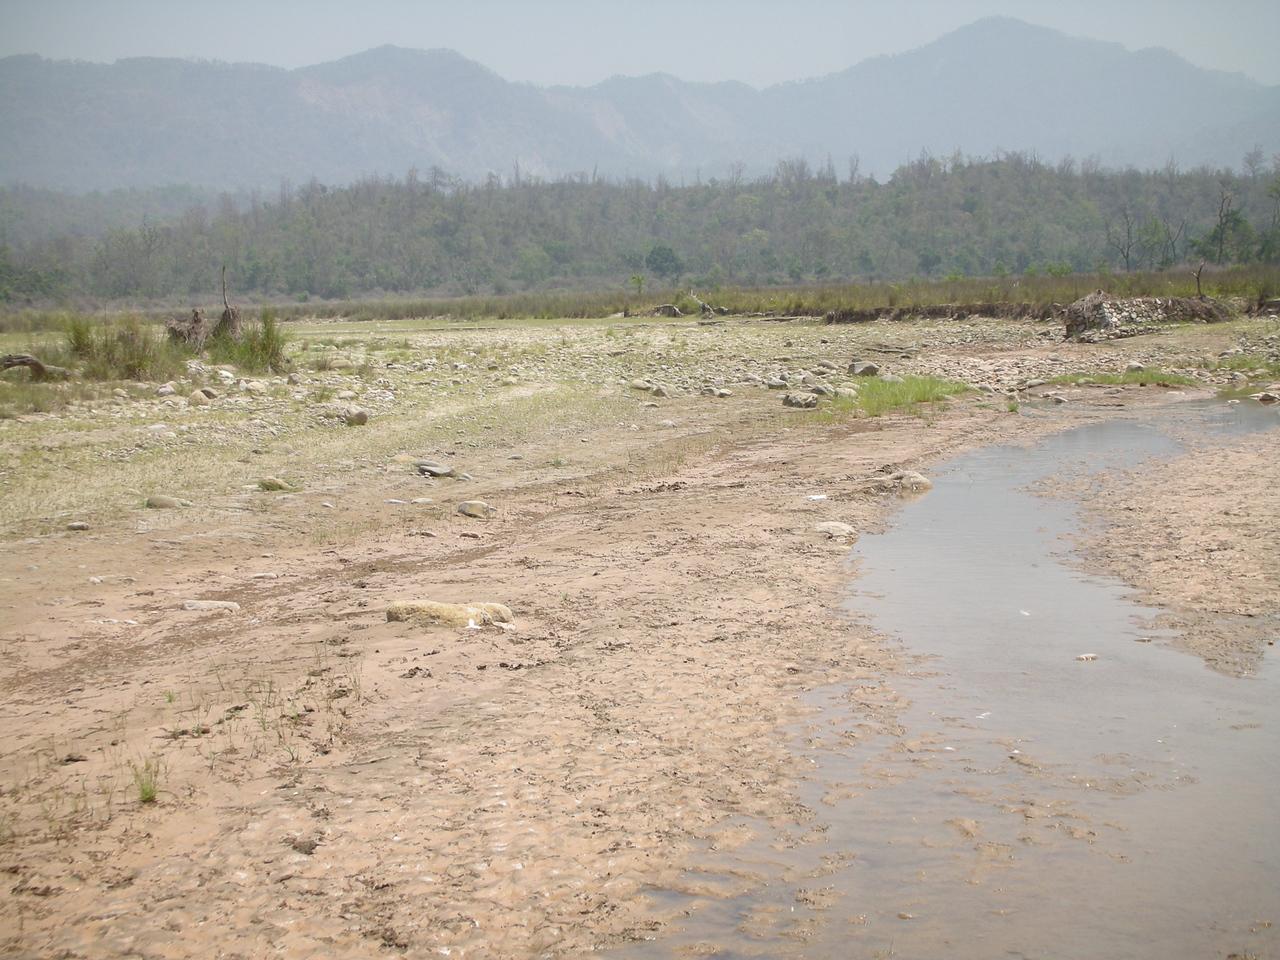 Rajaji National Park